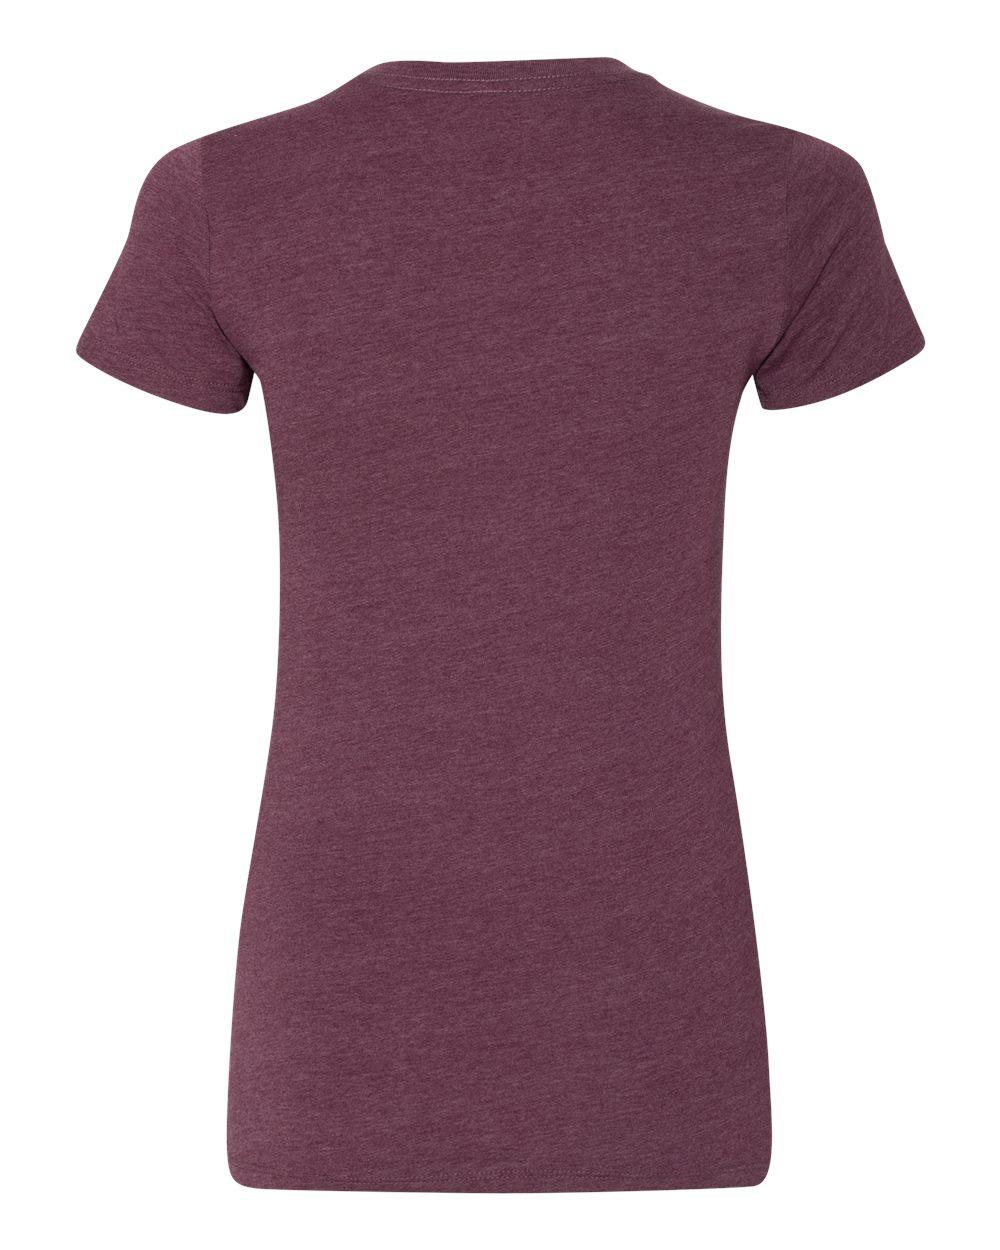 Bella-Canvas-Women-039-s-Favorite-T-Shirt-6004-S-2XL thumbnail 154